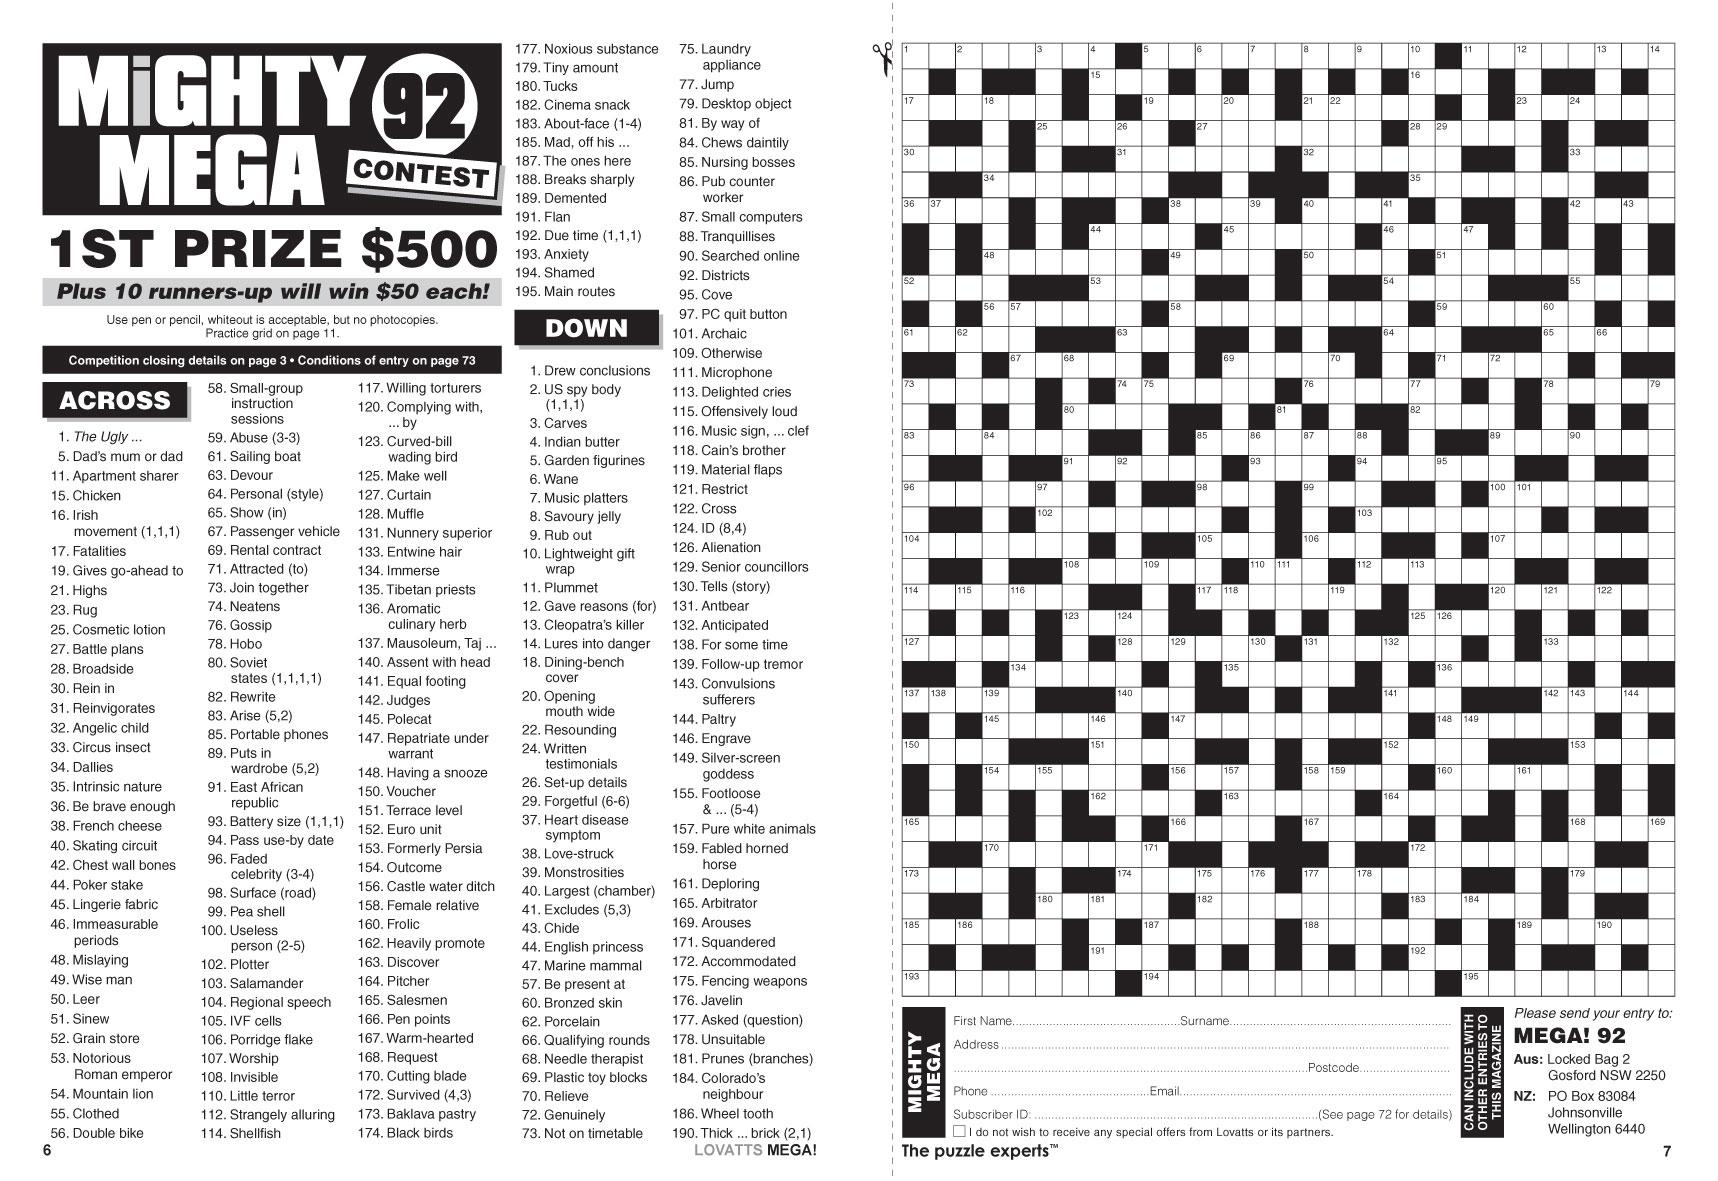 Giant Crossword Puzzle Printable 102 - Printable Pages - Giant Crossword Puzzle Printable